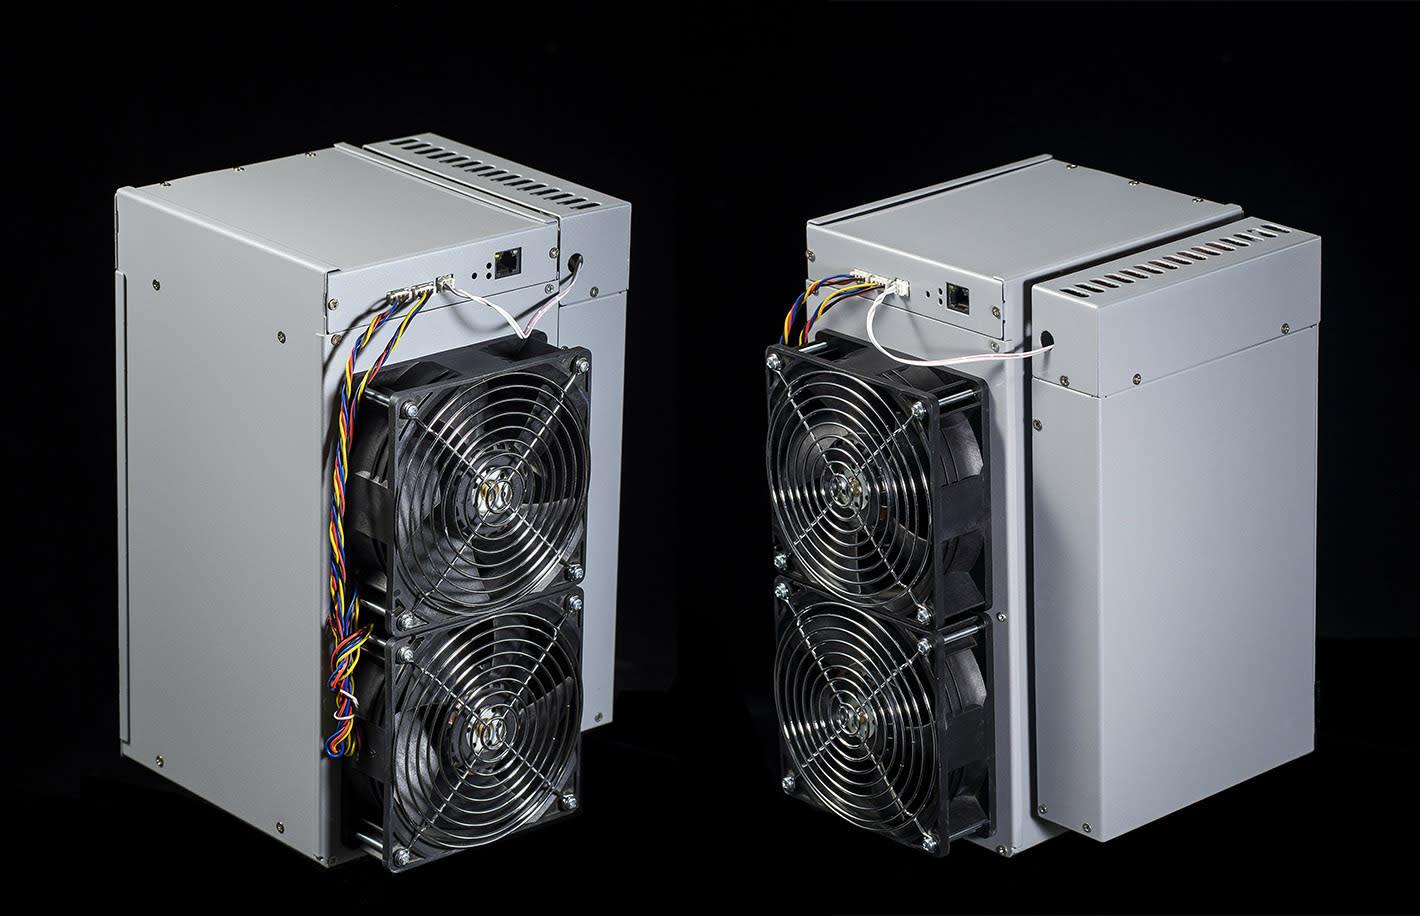 Bitcoin Miner Ebang Closes $70M Follow-Up Public Offering - Yahoo Finance